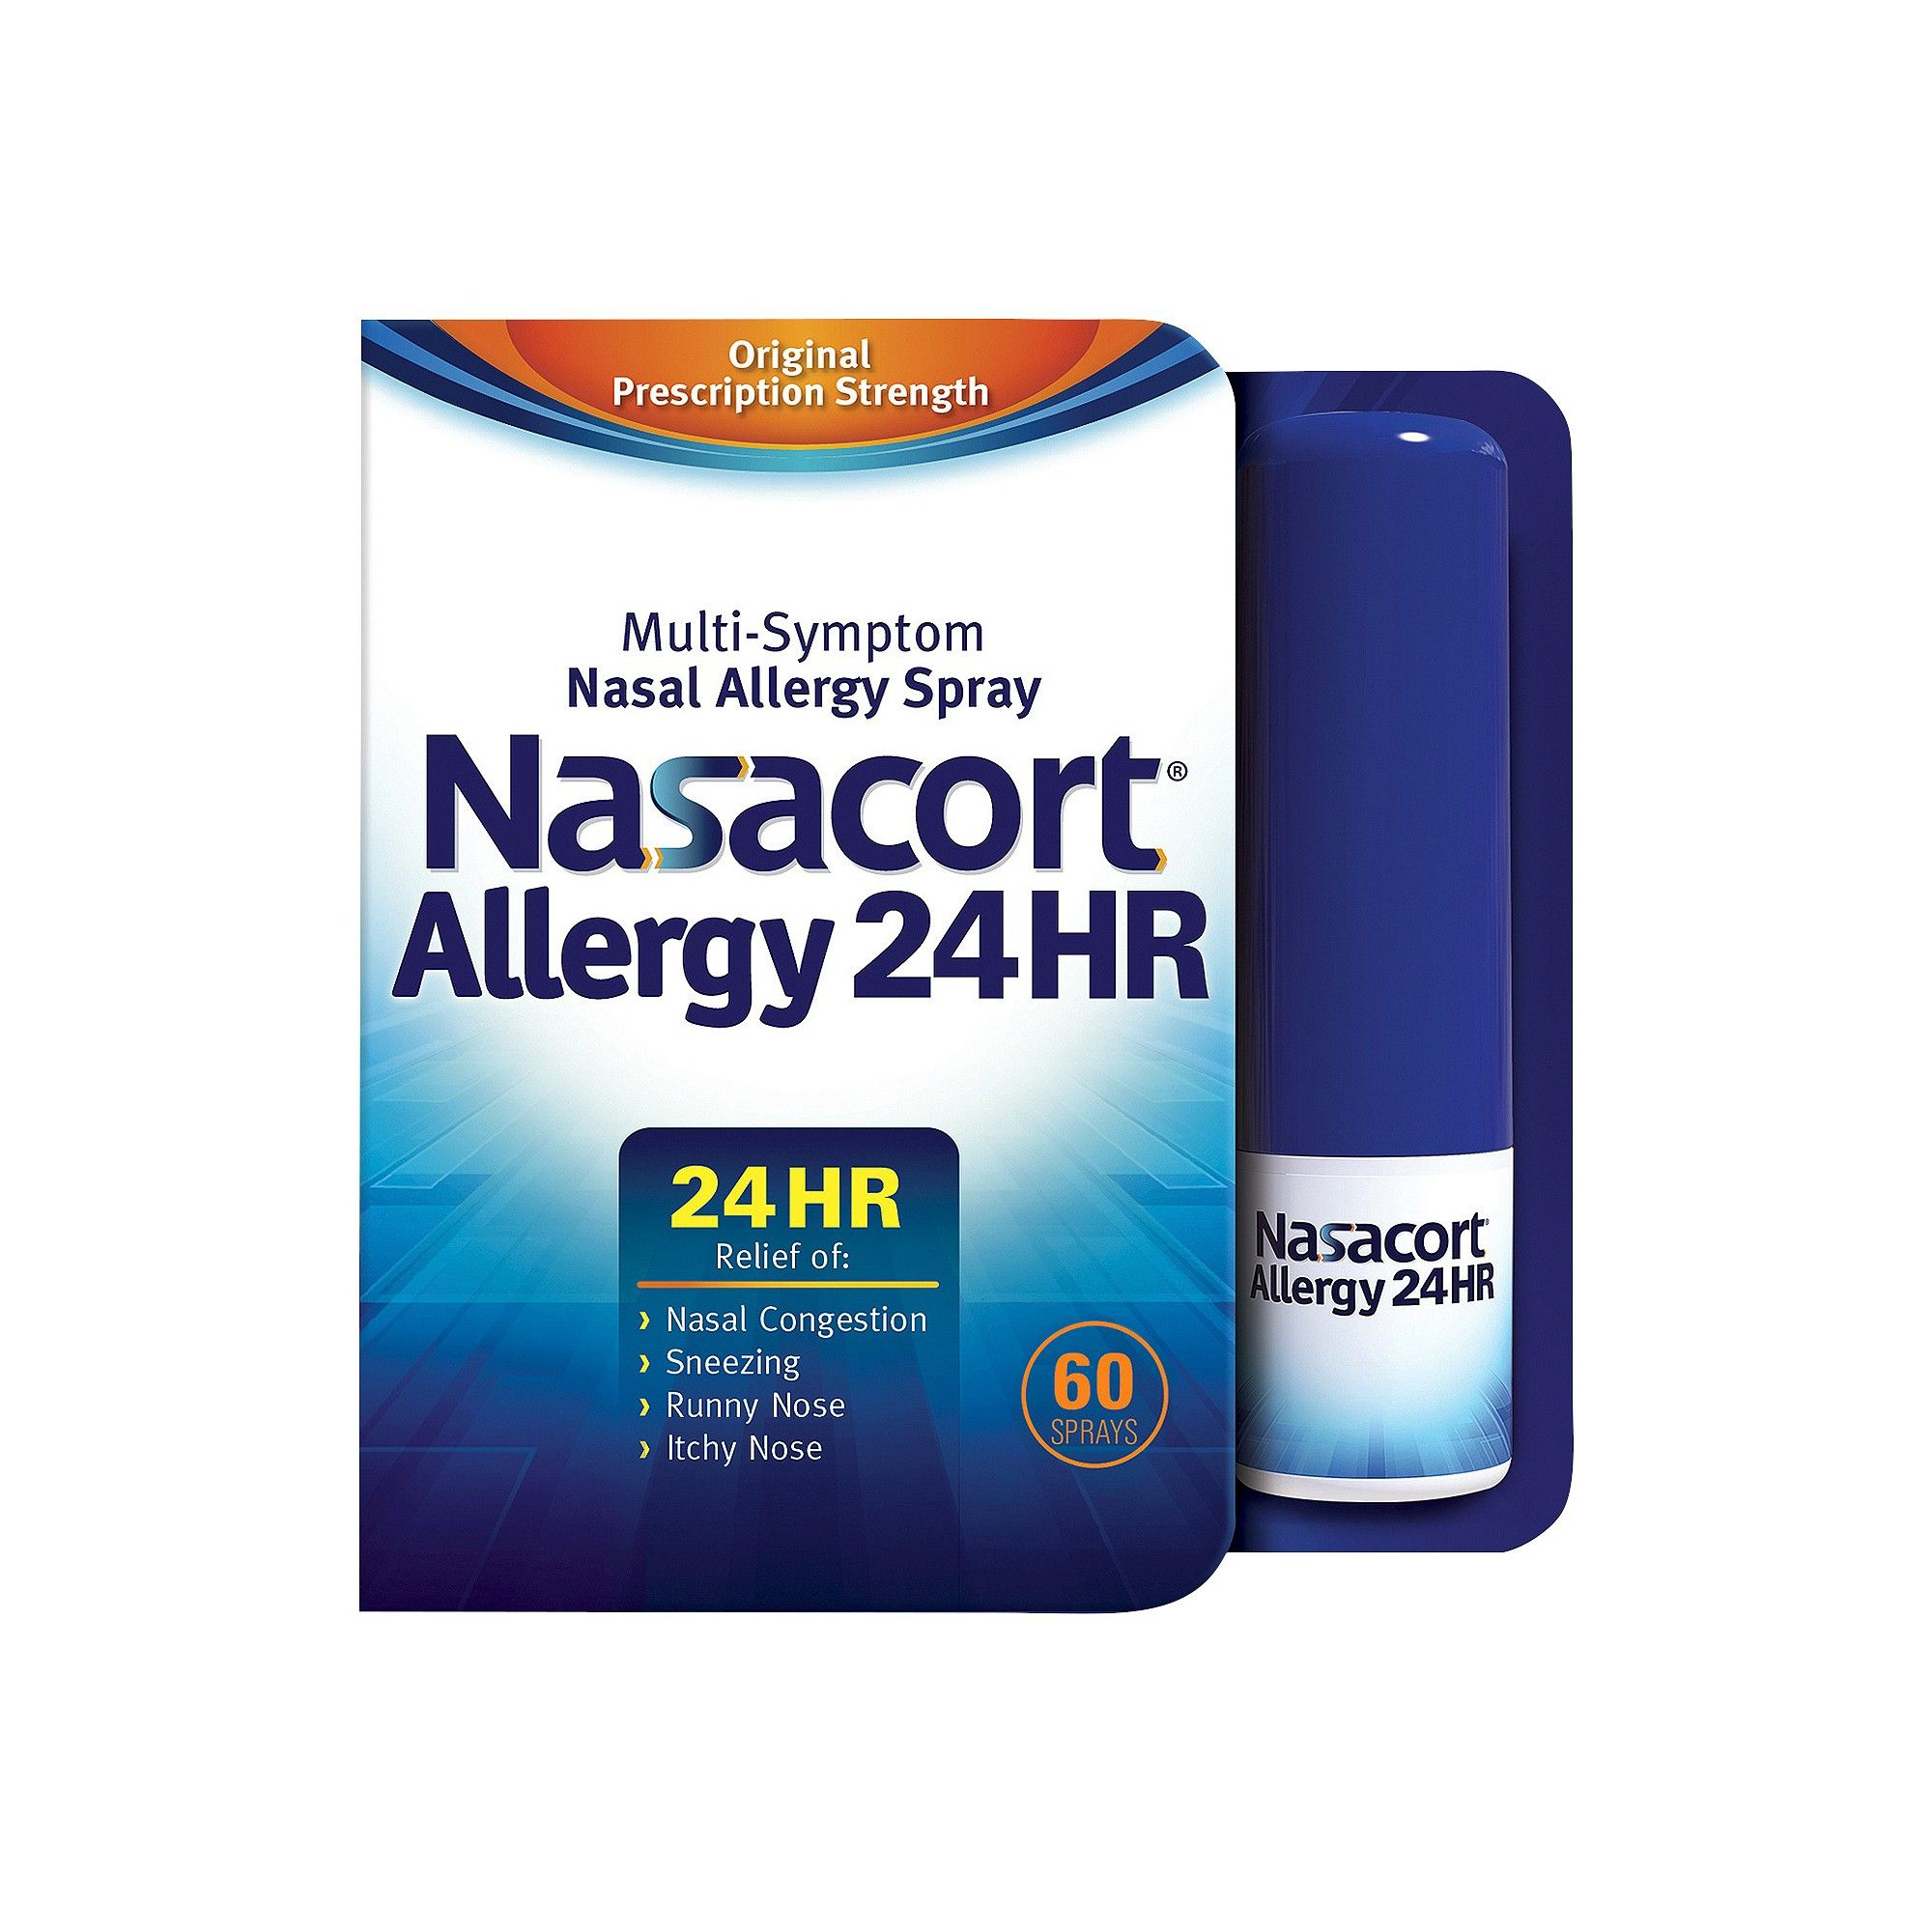 Nasacort Allergy 24HR Multi-Symptom Nasal Spray - 60 ...